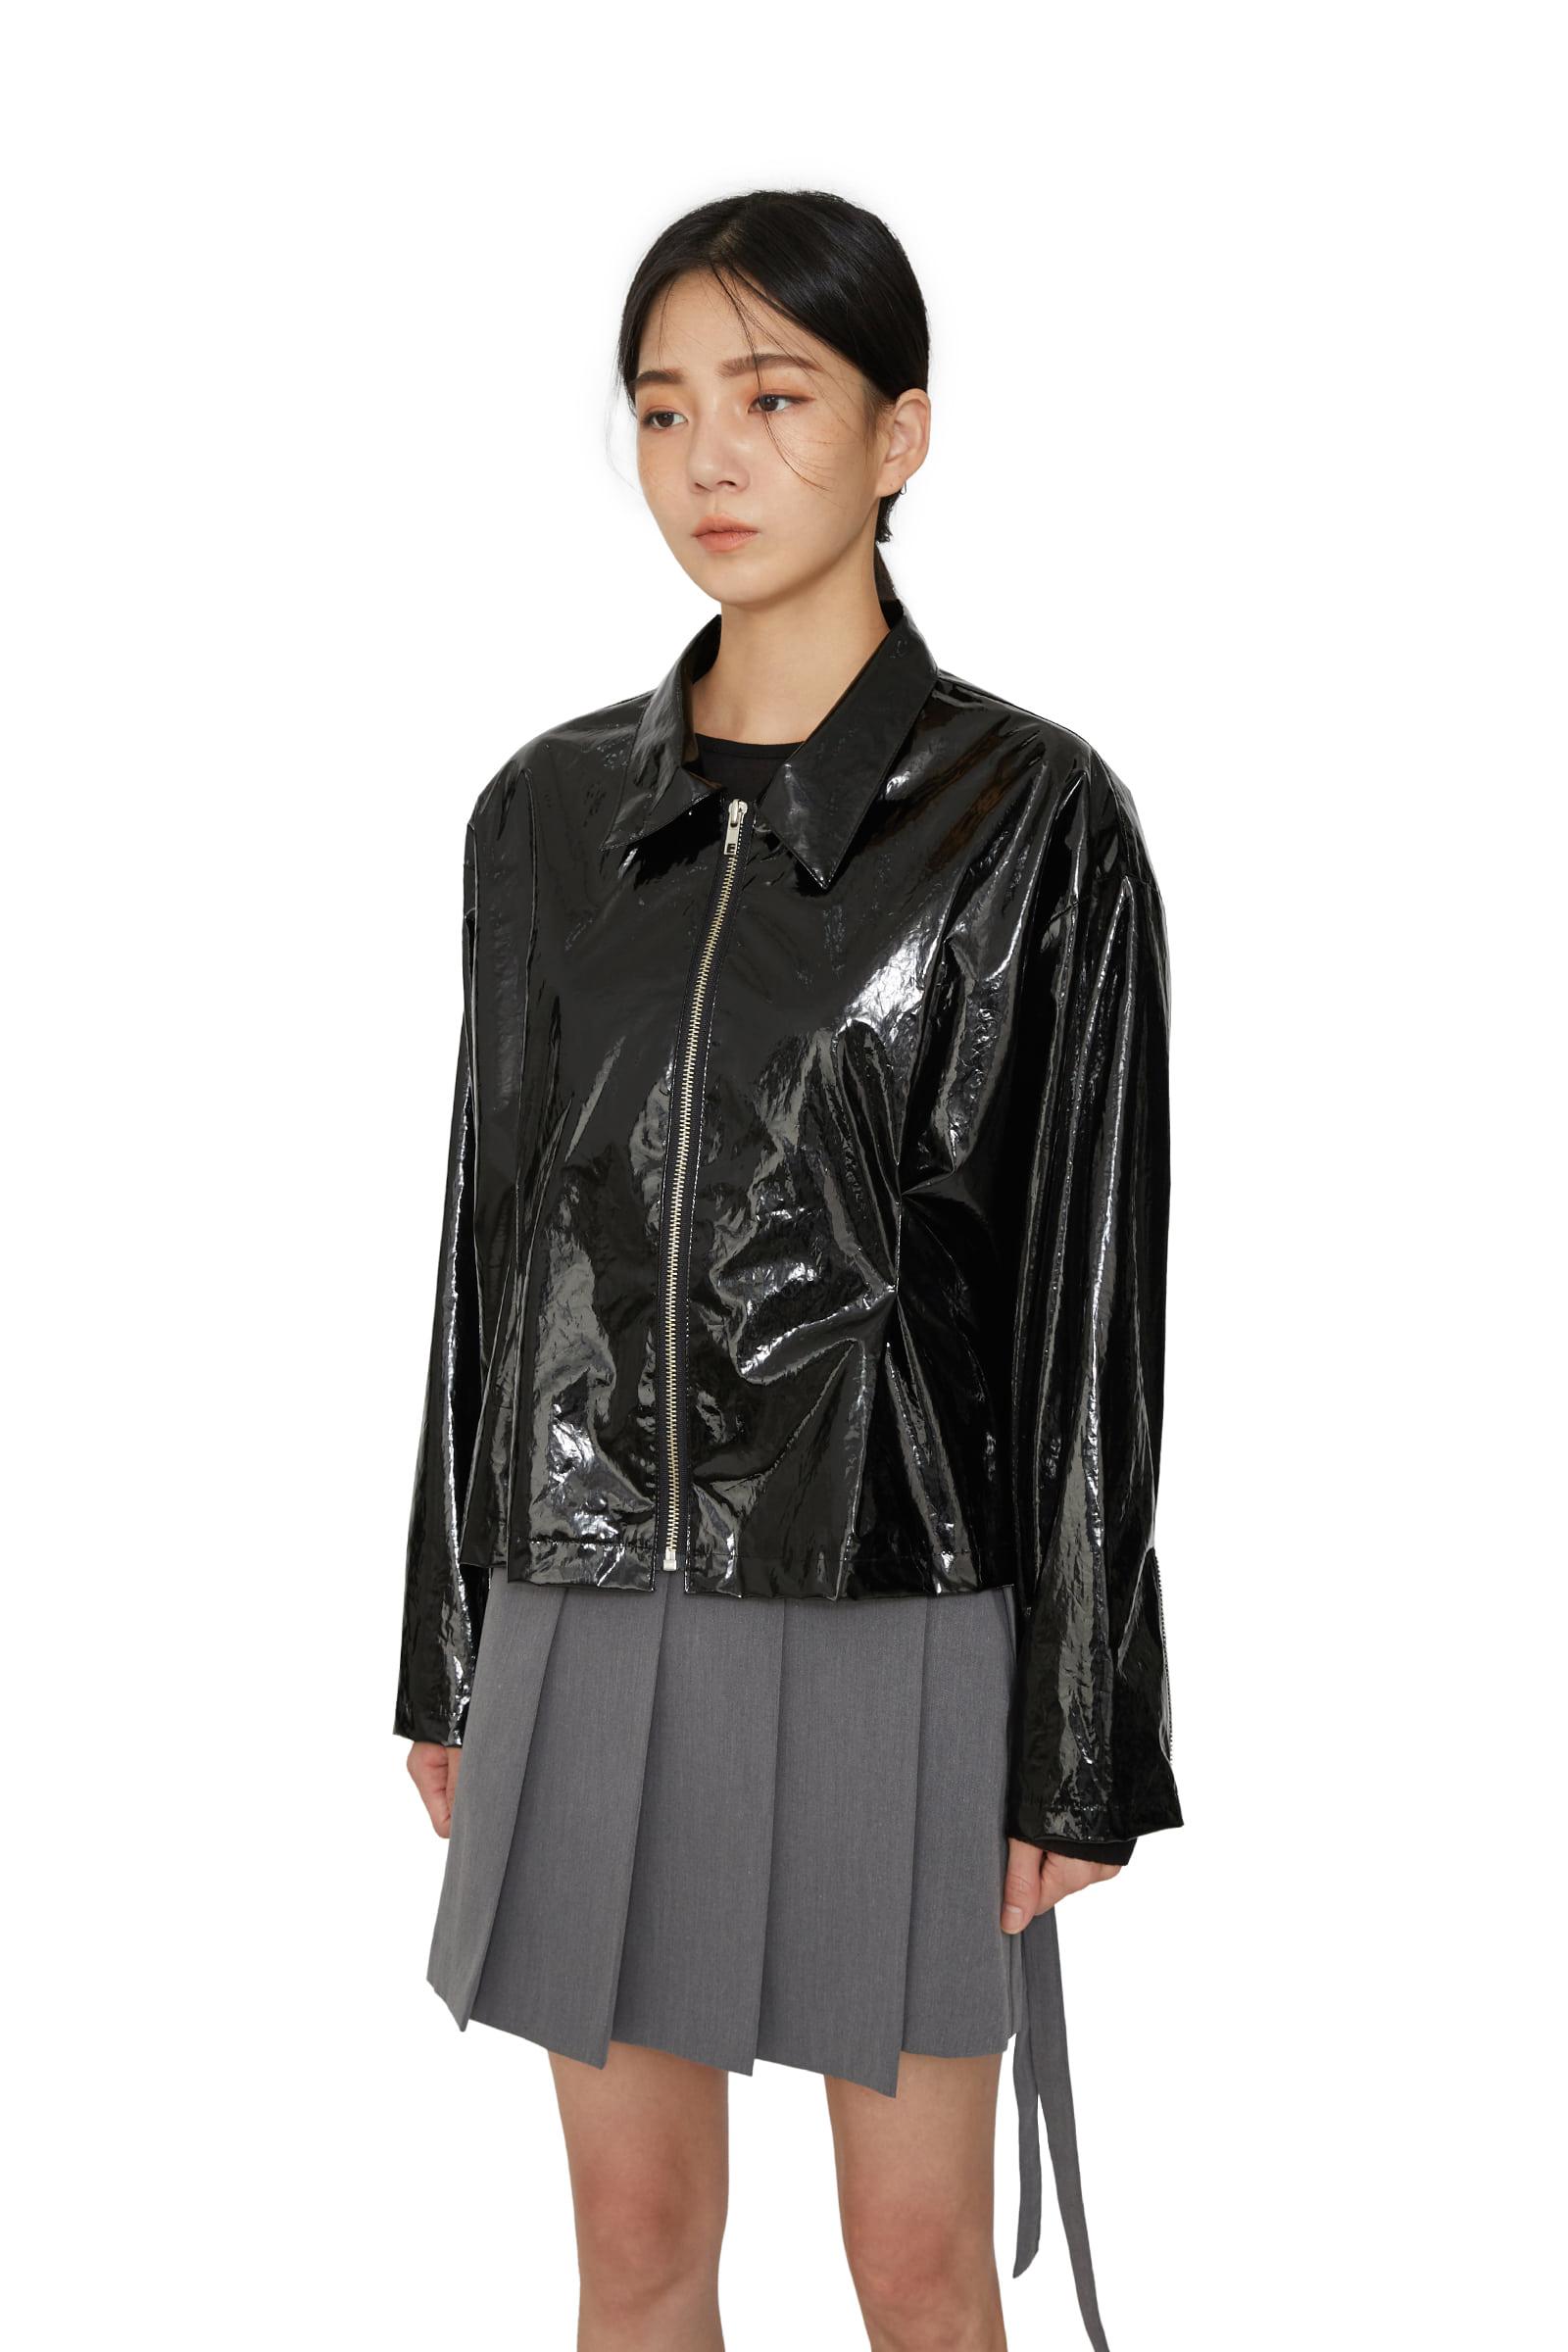 Glossy enamel pintuck jacket